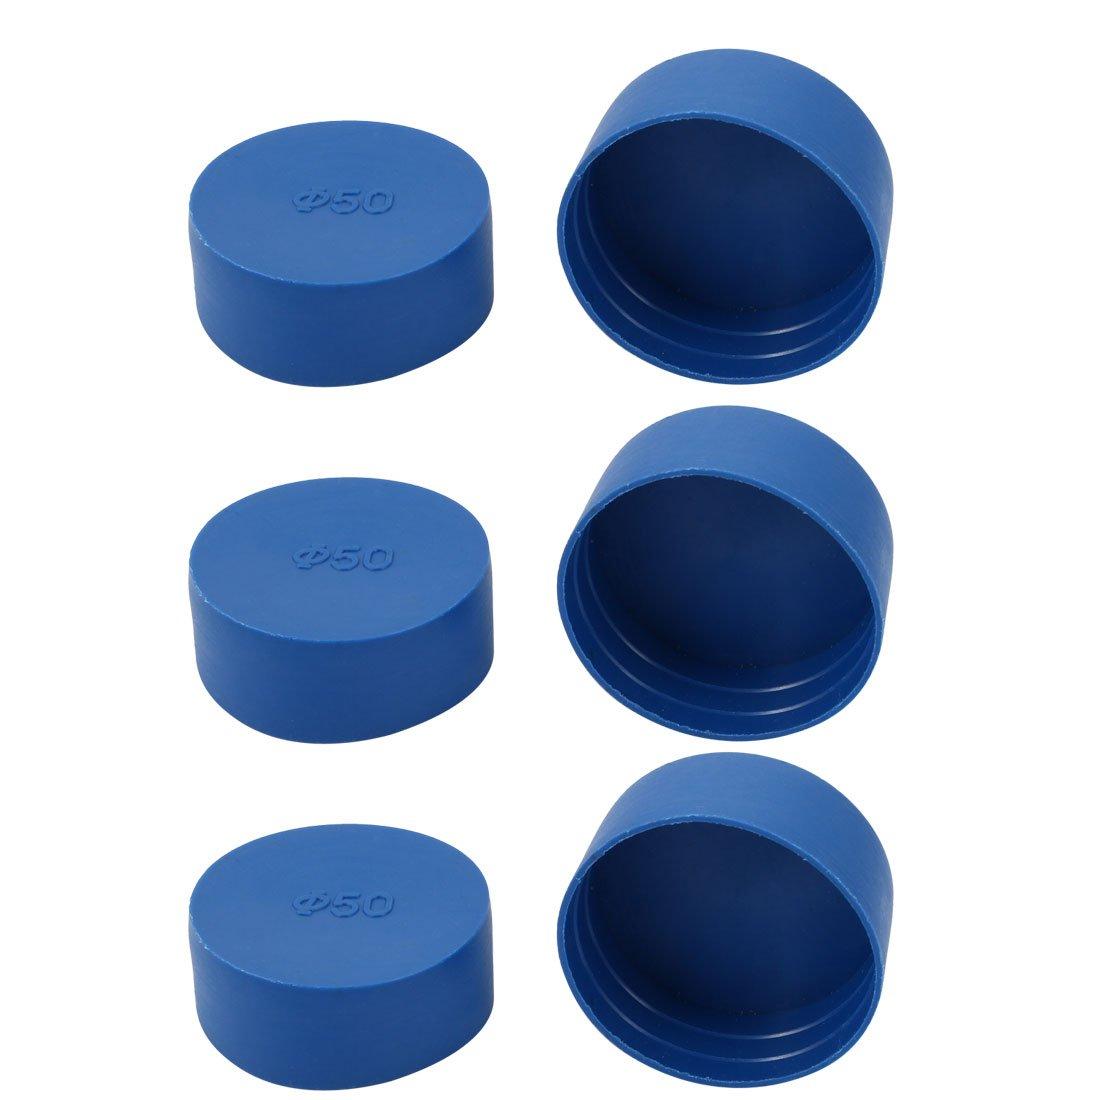 uxcell 6pcs 50mm Inner Dia PE Plastic End Cap Bolt Thread Protector Tube Cover Blue